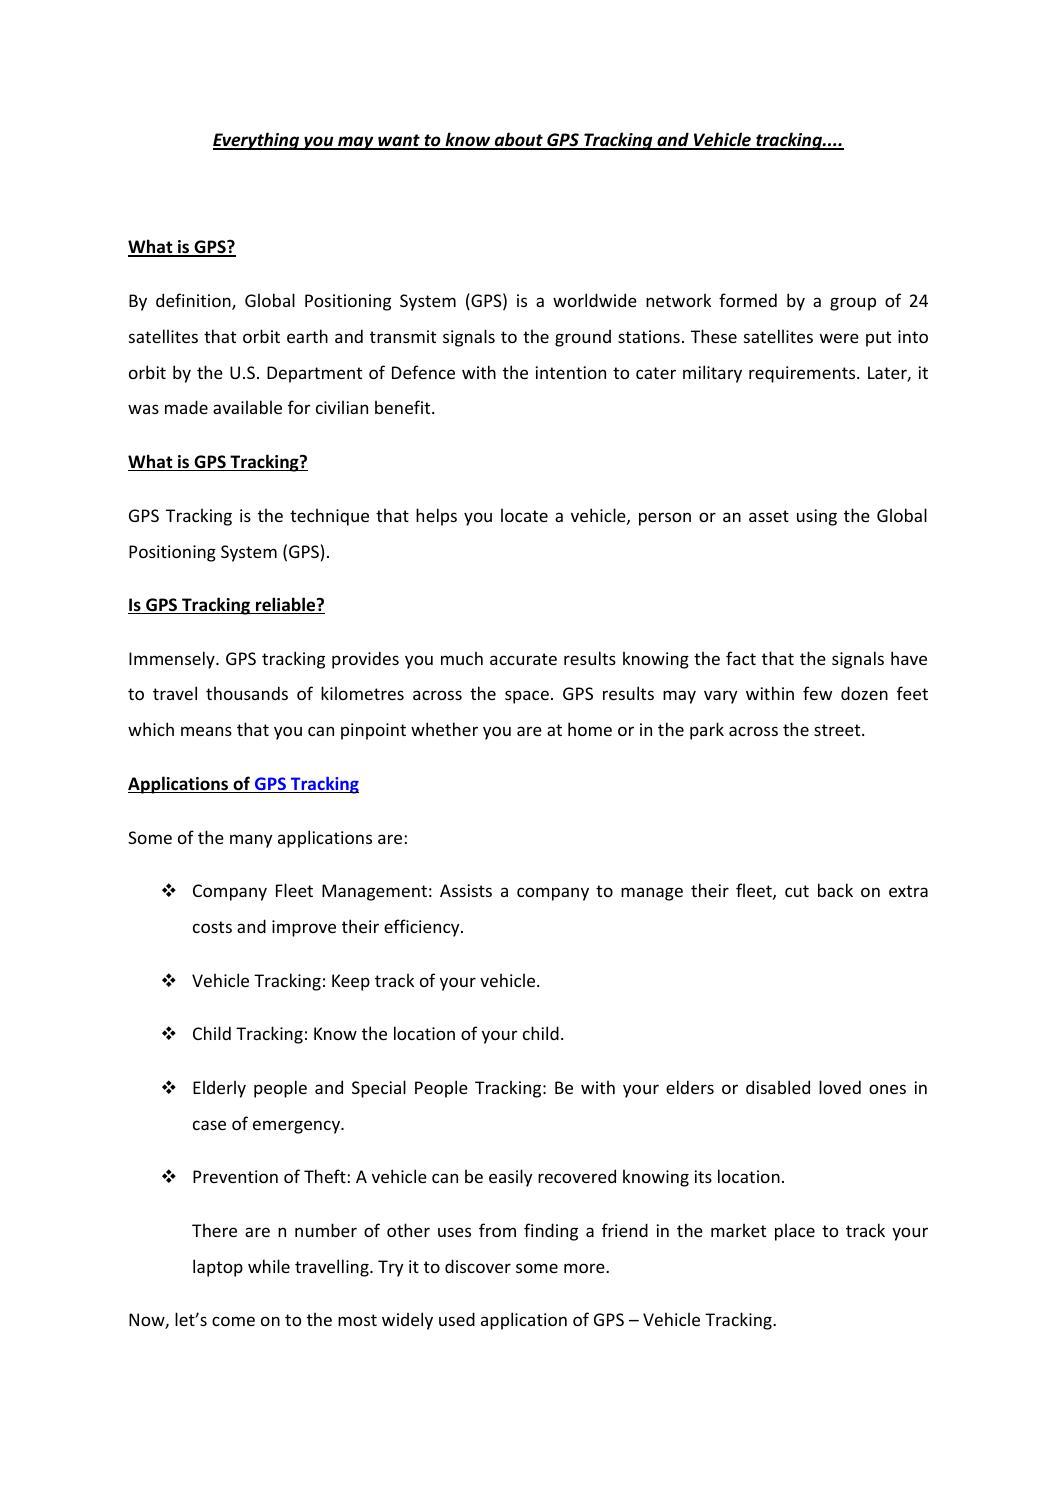 gps tracking and vehicle tracking by shalini madan - issuu